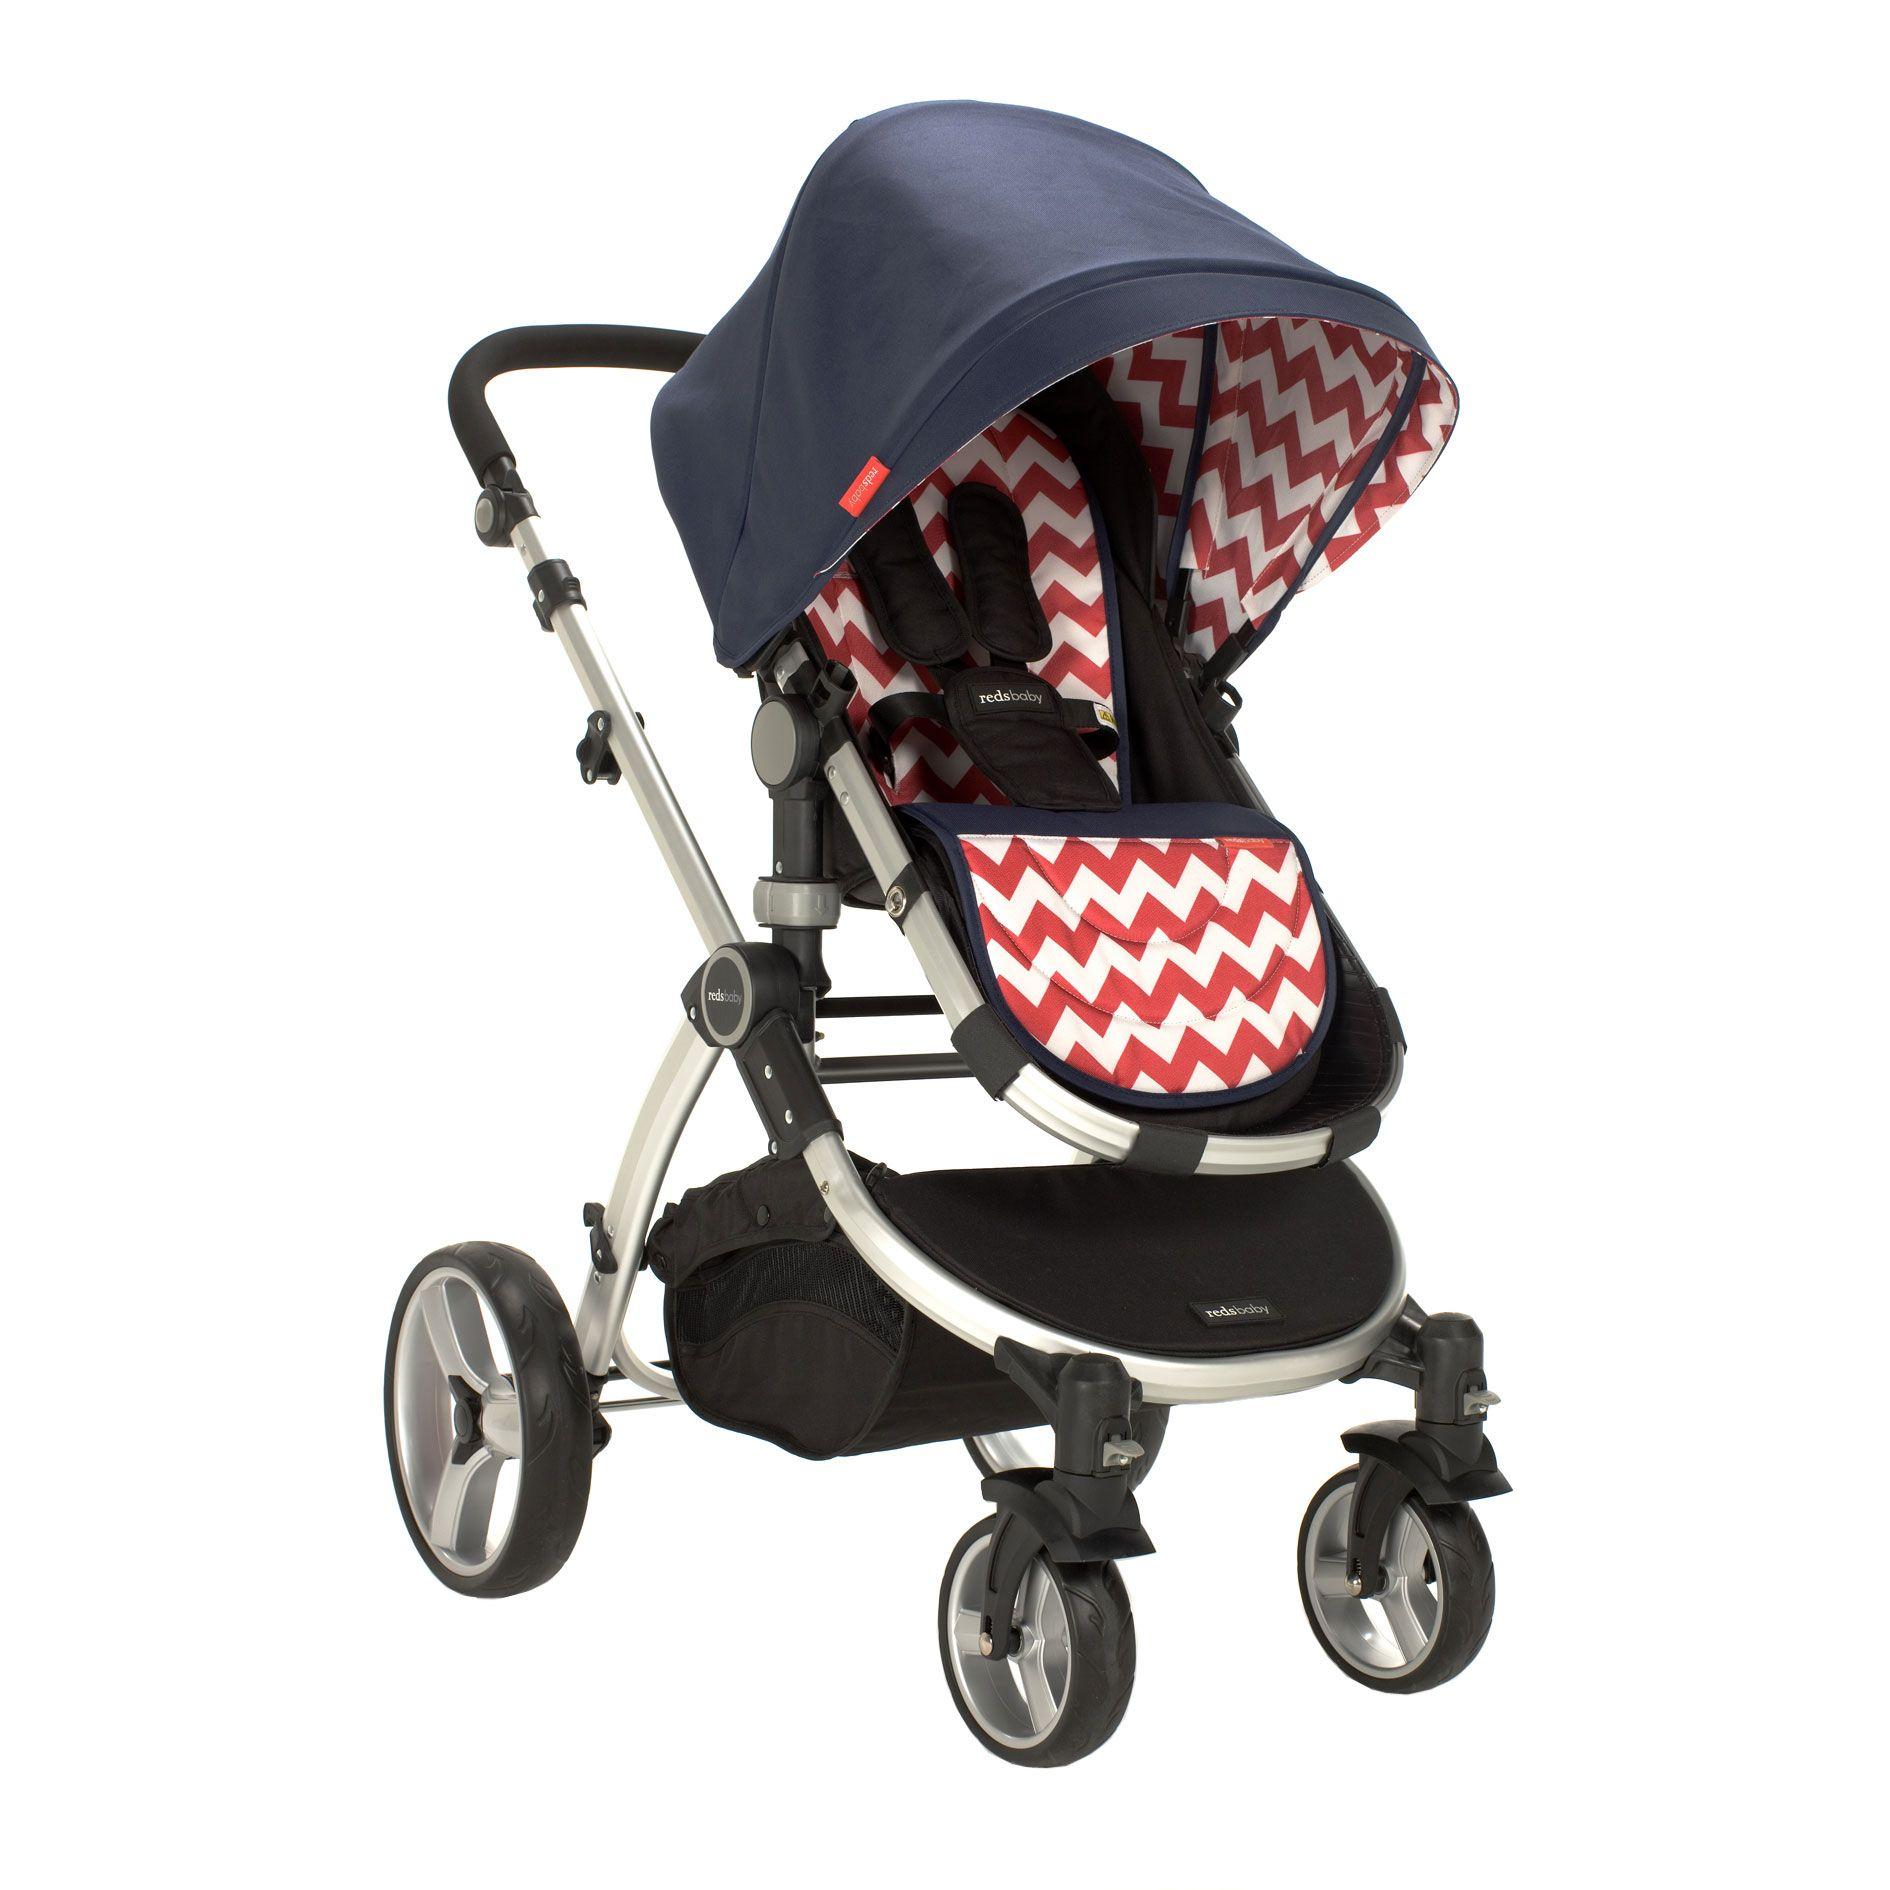 redsbaby bounce  the utlimate allinone stroller pram www  - redsbaby bounce  the utlimate allinone stroller pram wwwredsbaby